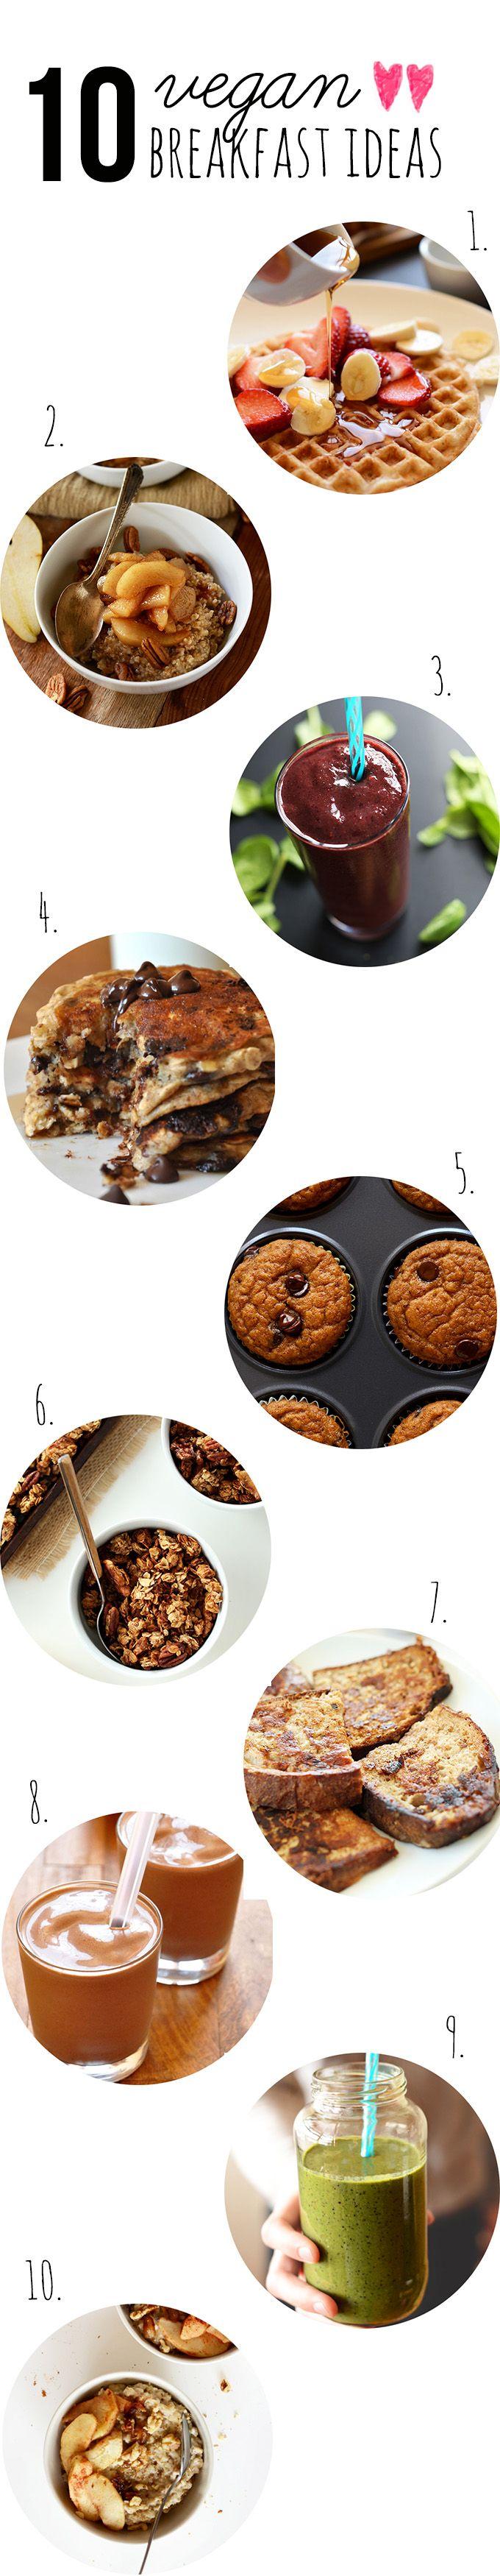 10 Vegan Breakfast Ideas!